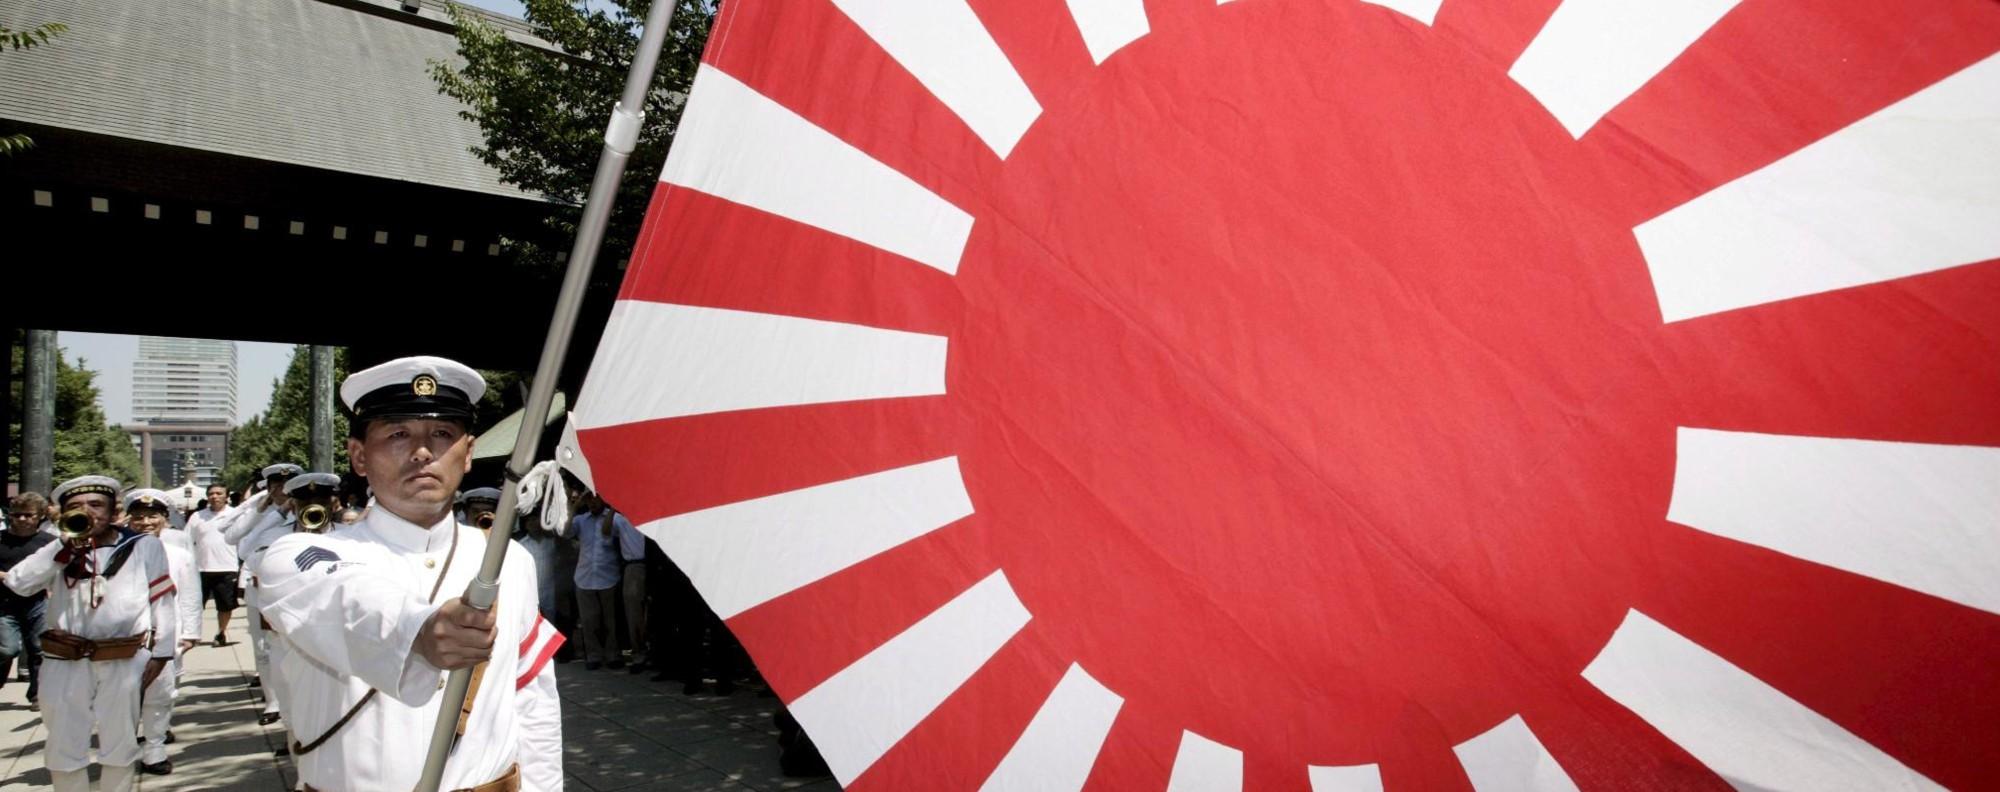 Controversial: Japan's Rising Sun flag. Photo: EPA